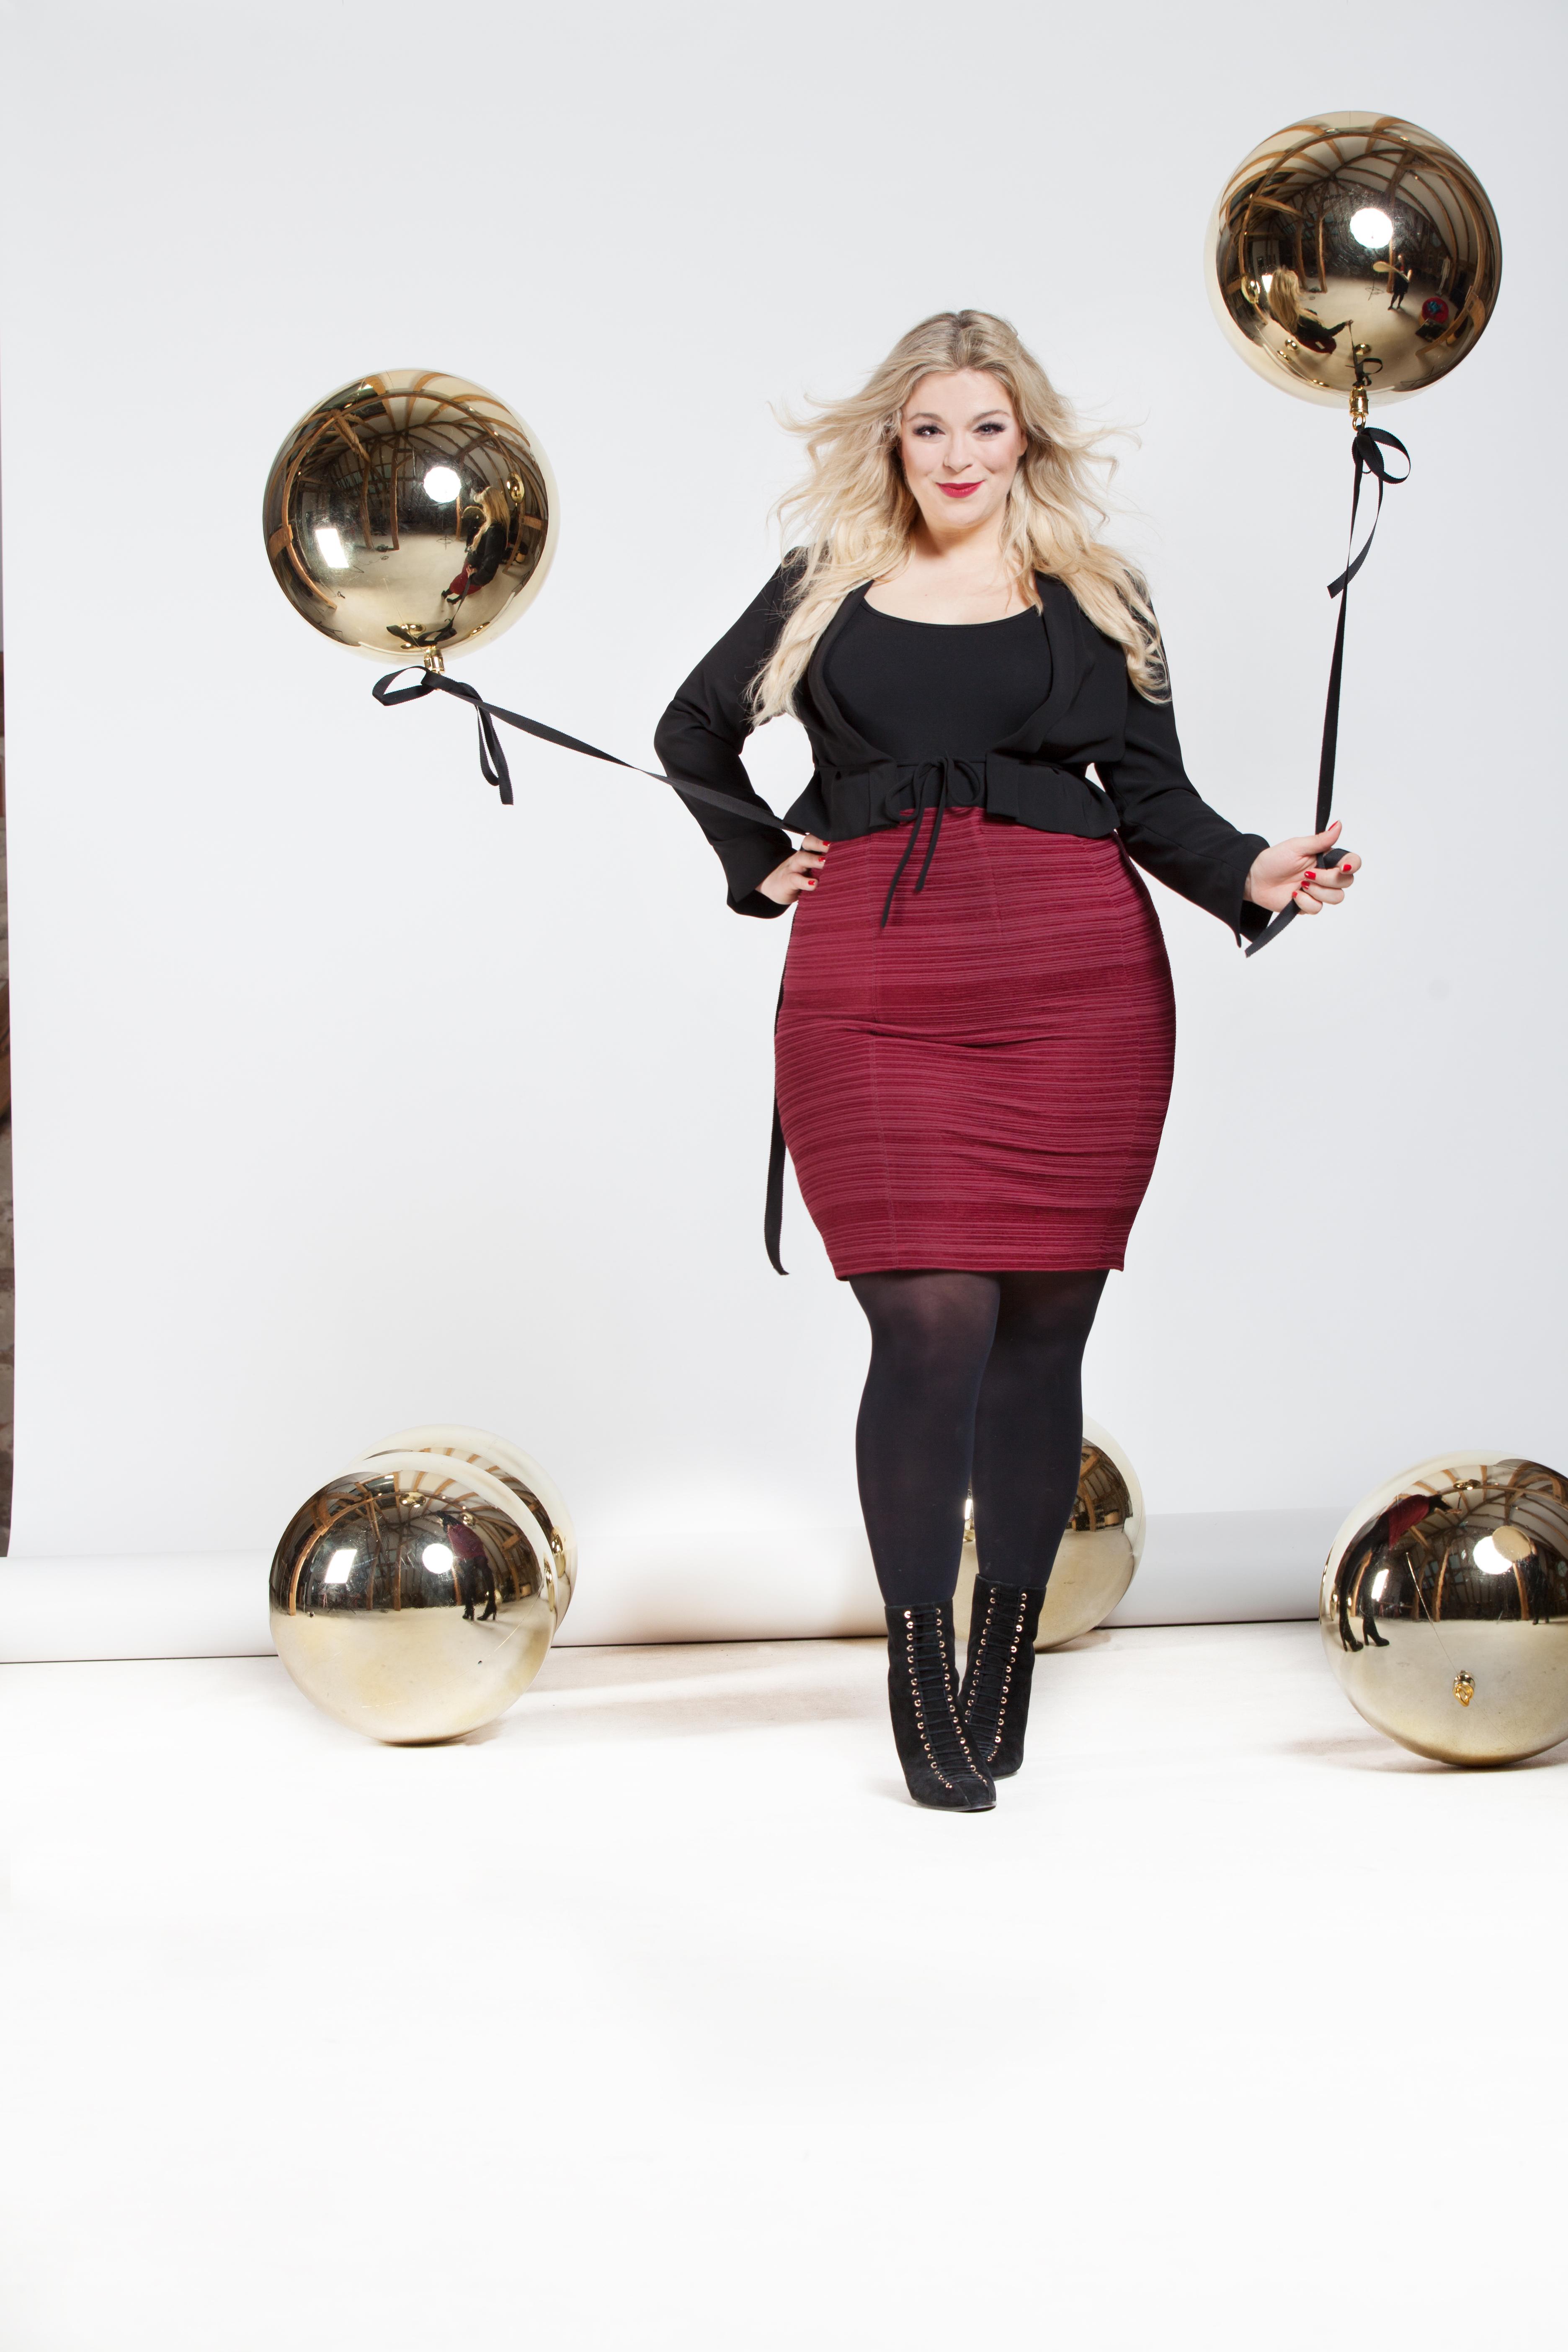 Megabambi-Caterina-pogorzelski-Plusisze-evelin-brandt-Model